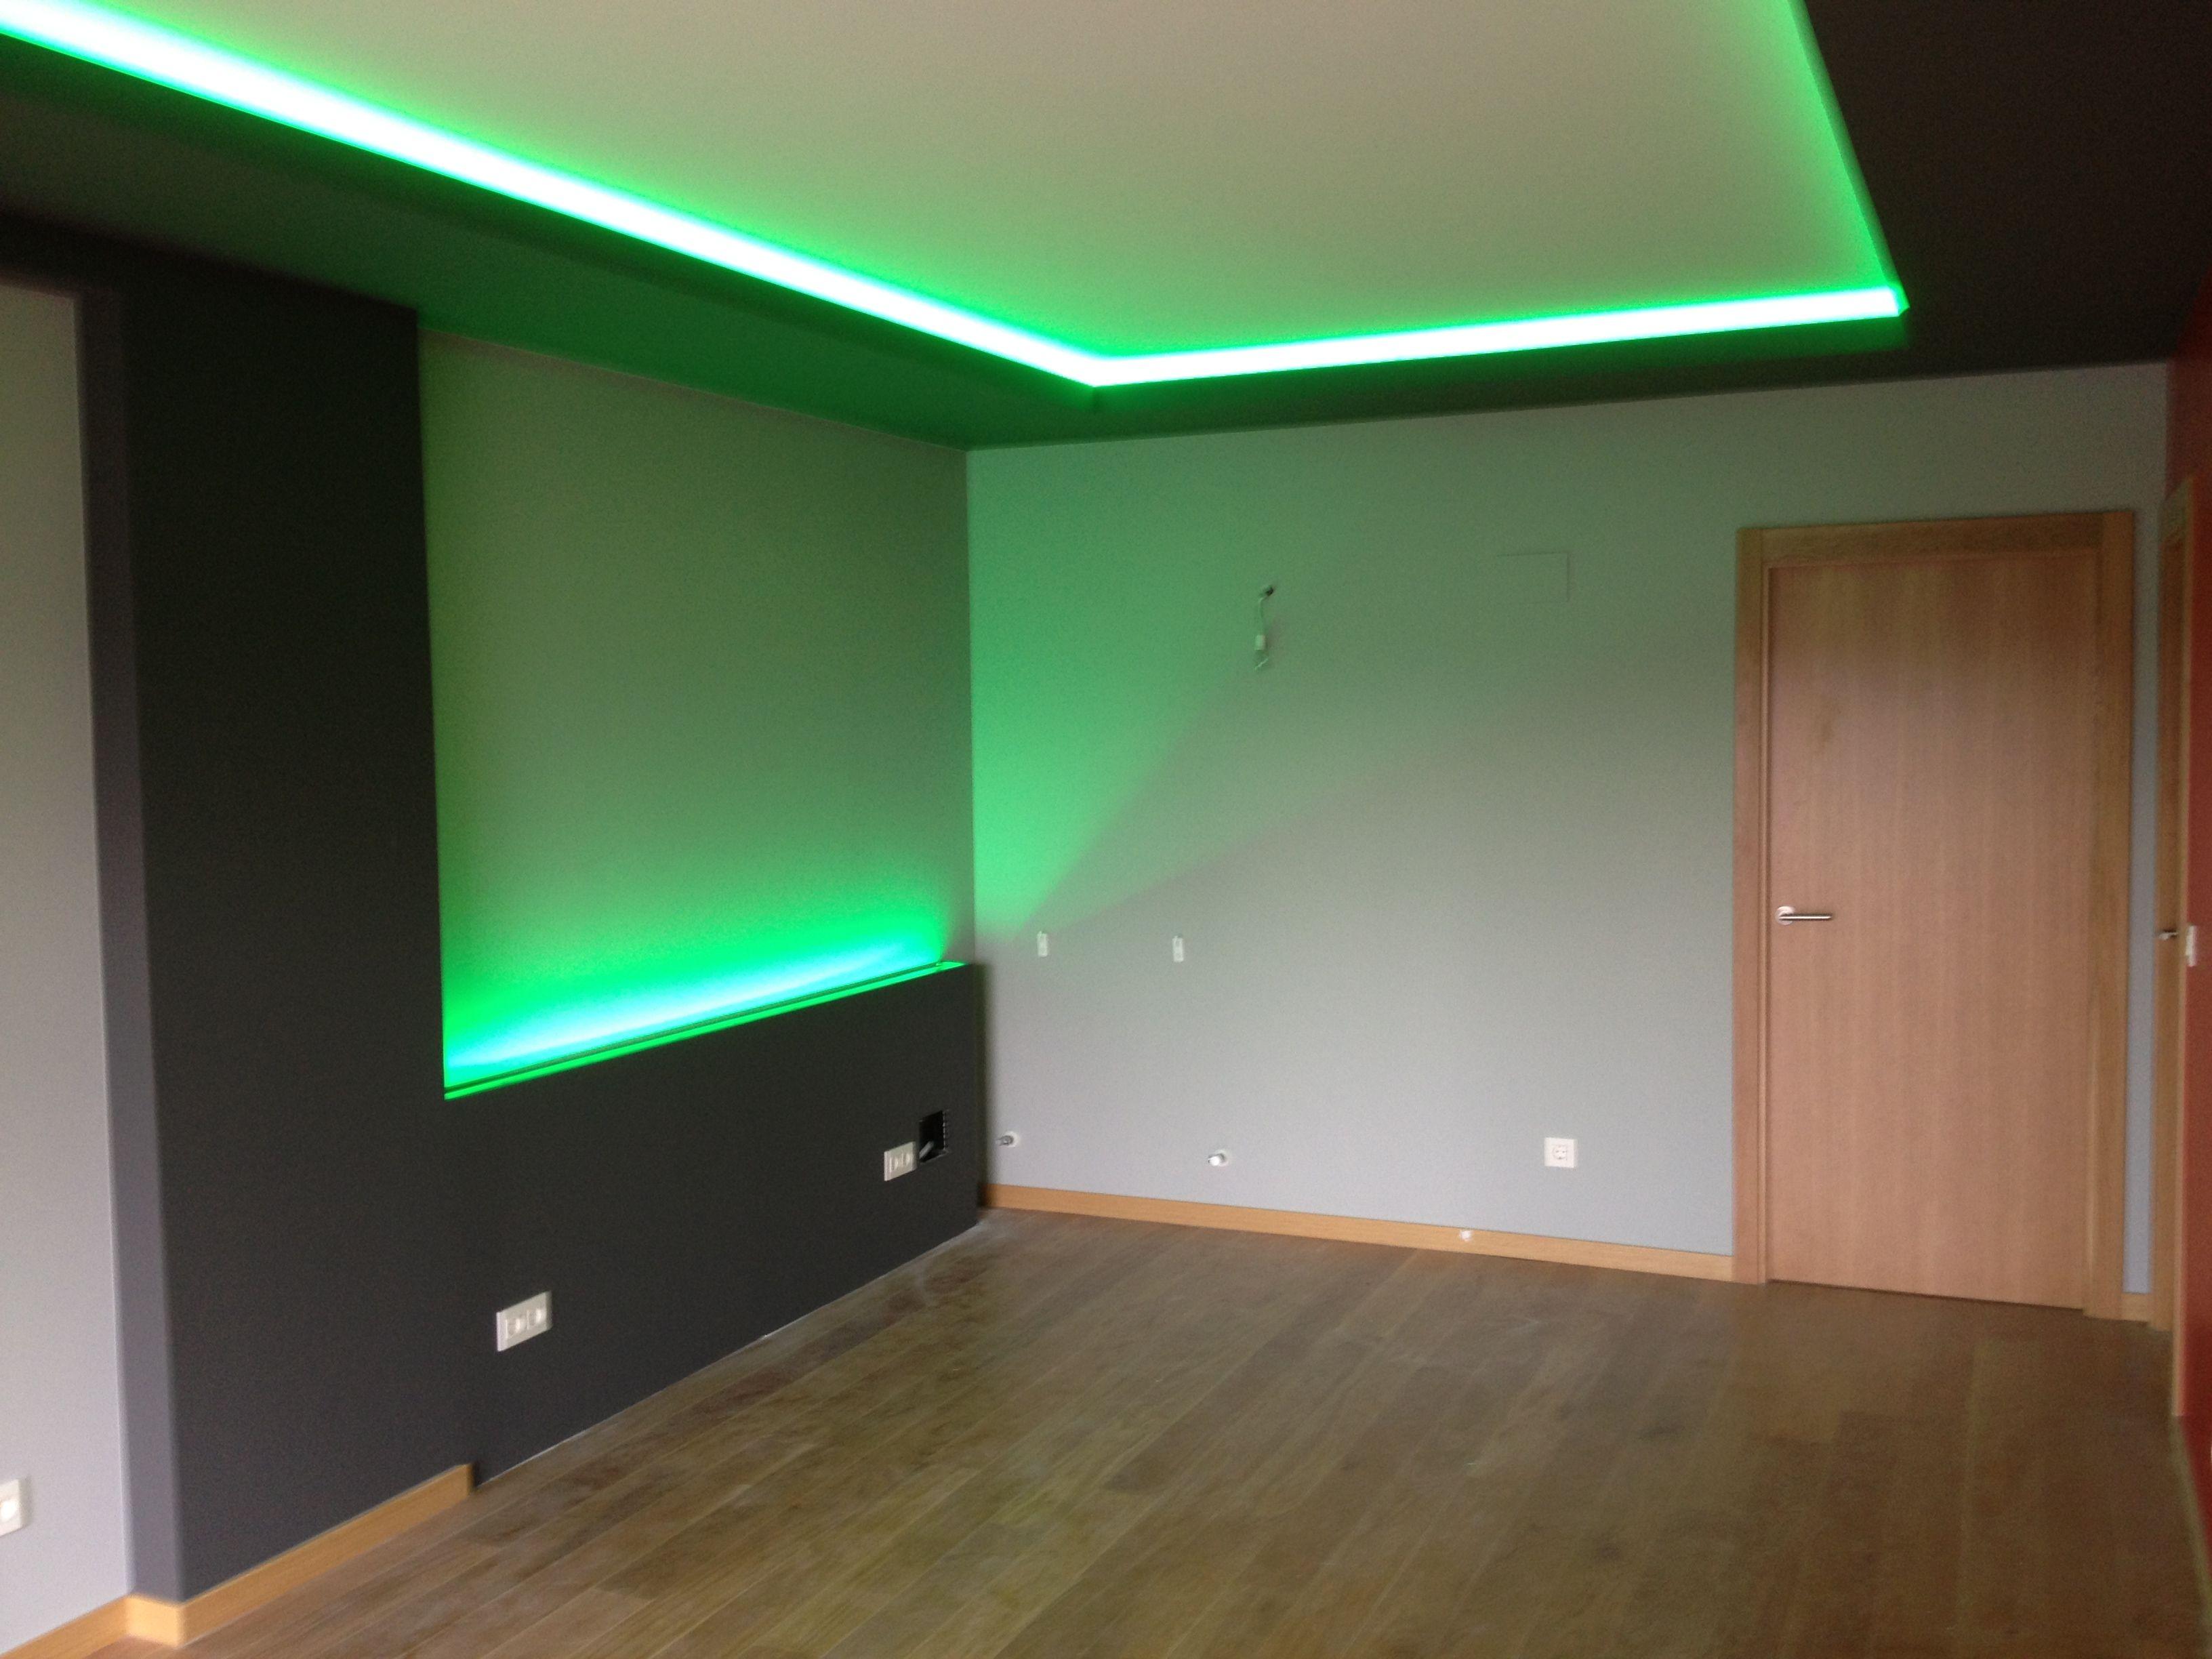 Tira rgb en sal n 3 decoracion en pladur pinterest - Iluminacion led salon ...